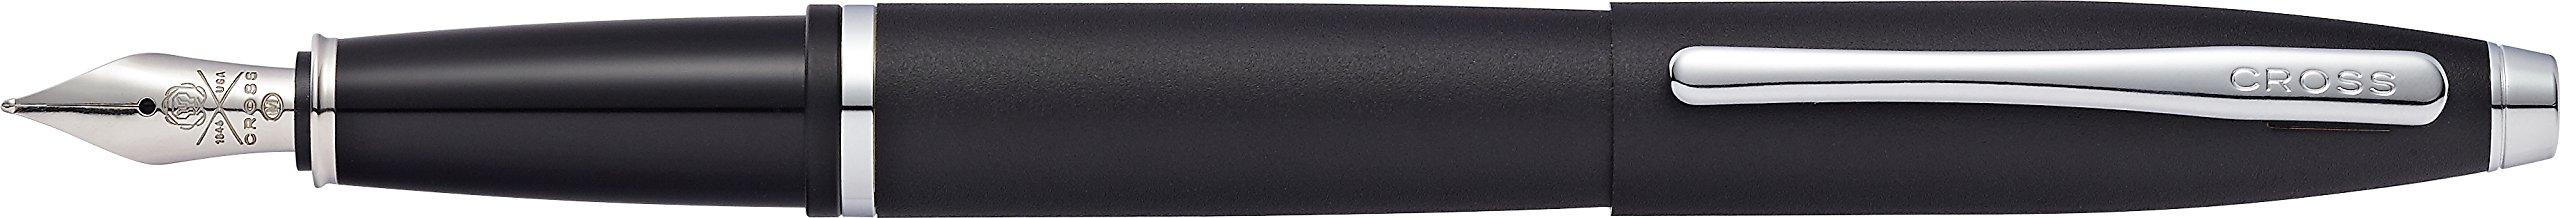 Cross Calais Matte Black Fountain Pen with Stainless Steel Medium Nib